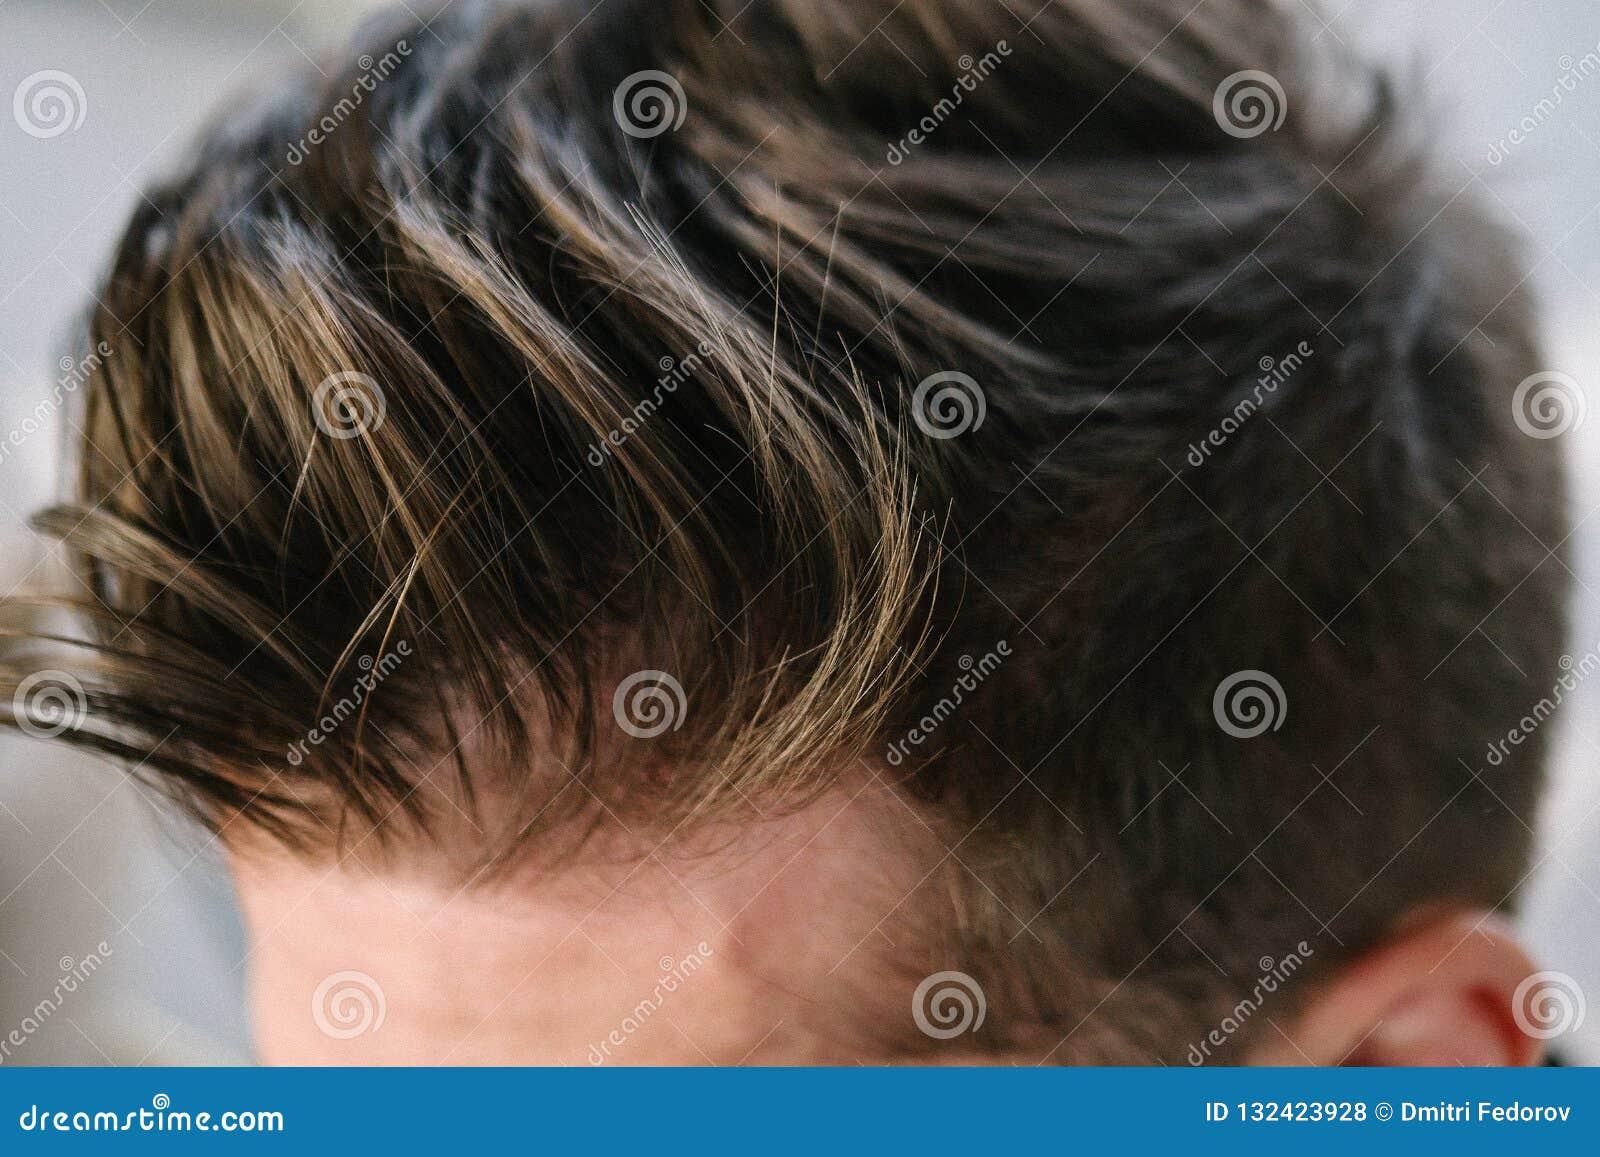 Sensational Stylish Men S Hairstyle Close Up Hair Brown Stock Photo Image Schematic Wiring Diagrams Amerangerunnerswayorg